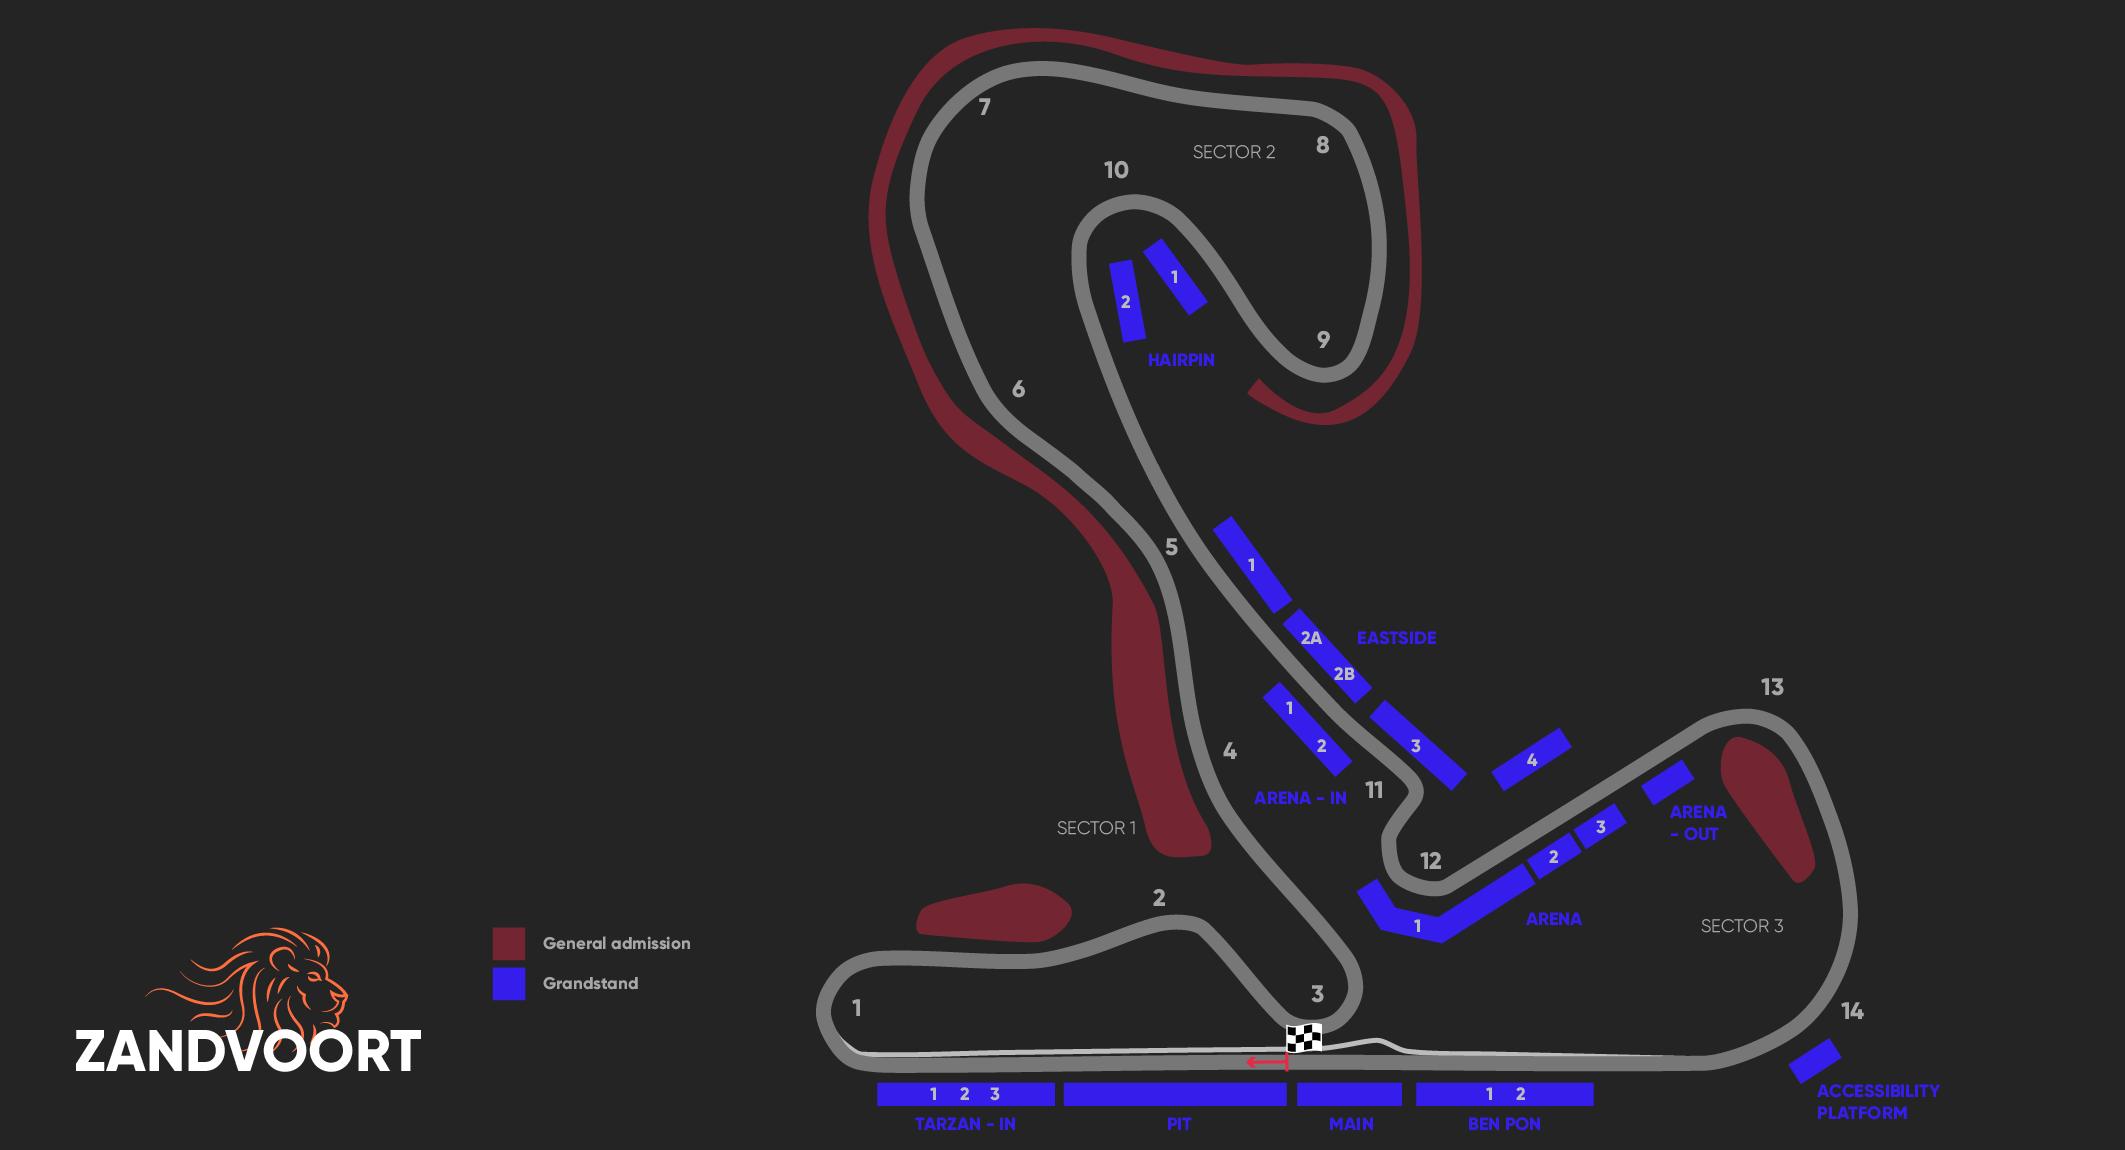 F1 Nederland 2021 – Red Bull Racing Paddock Club ™ Hospitality